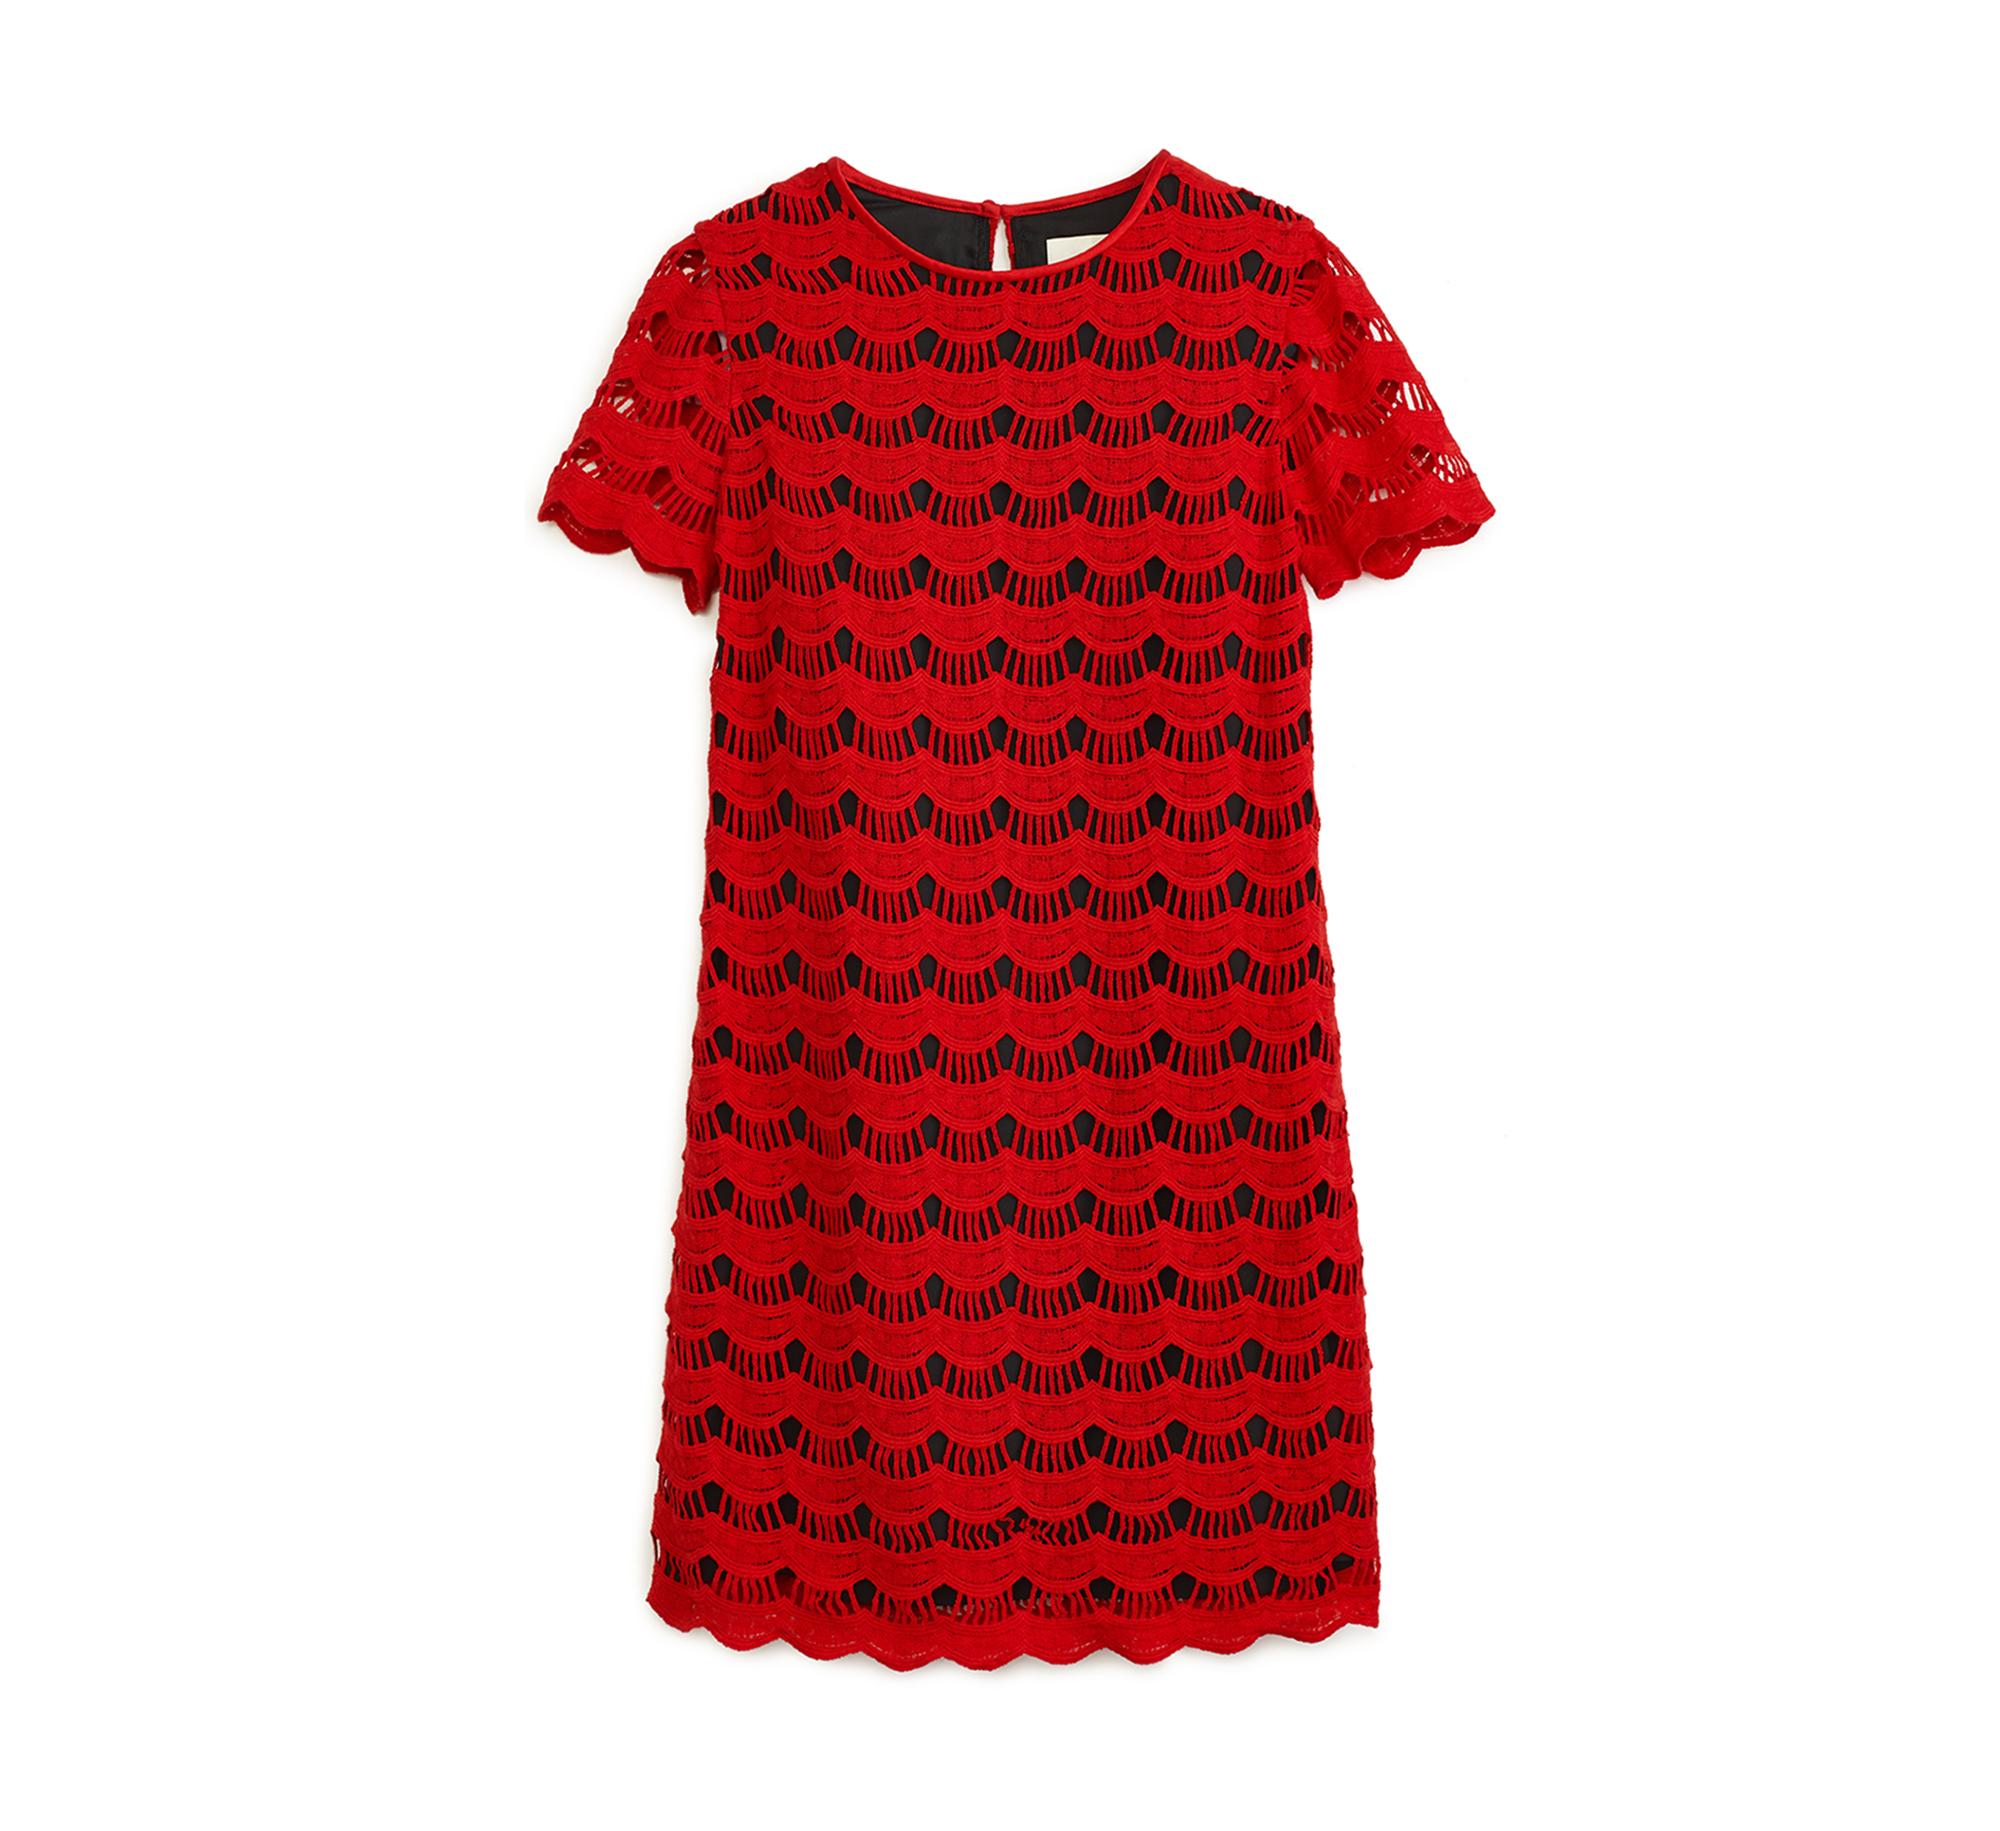 virginia lace dress TW$17500